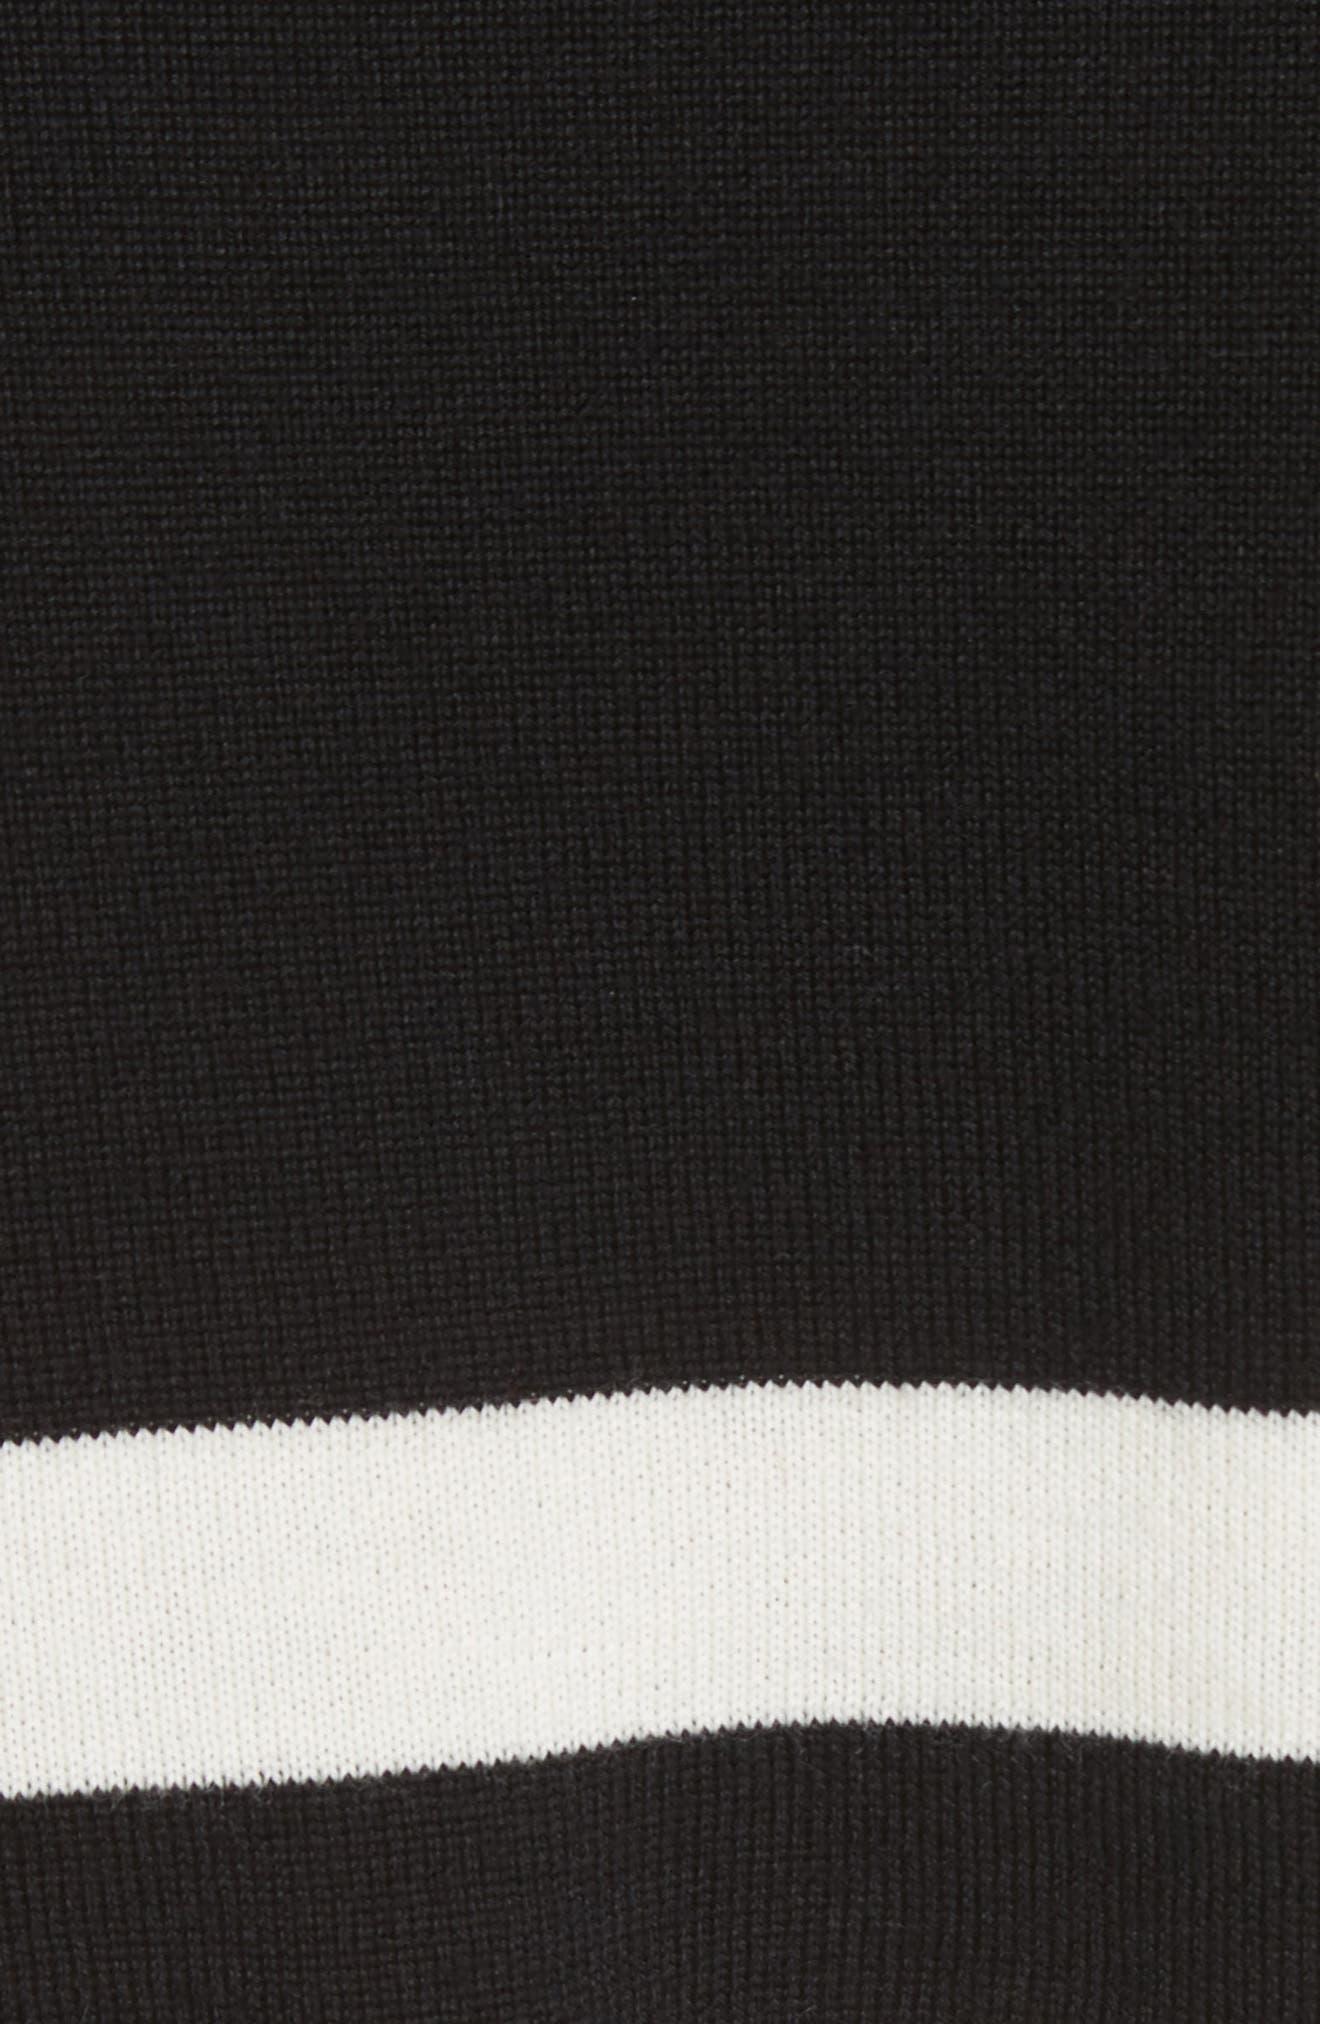 Love Stripe Crop Wool Sweater,                             Alternate thumbnail 5, color,                             Black/ White